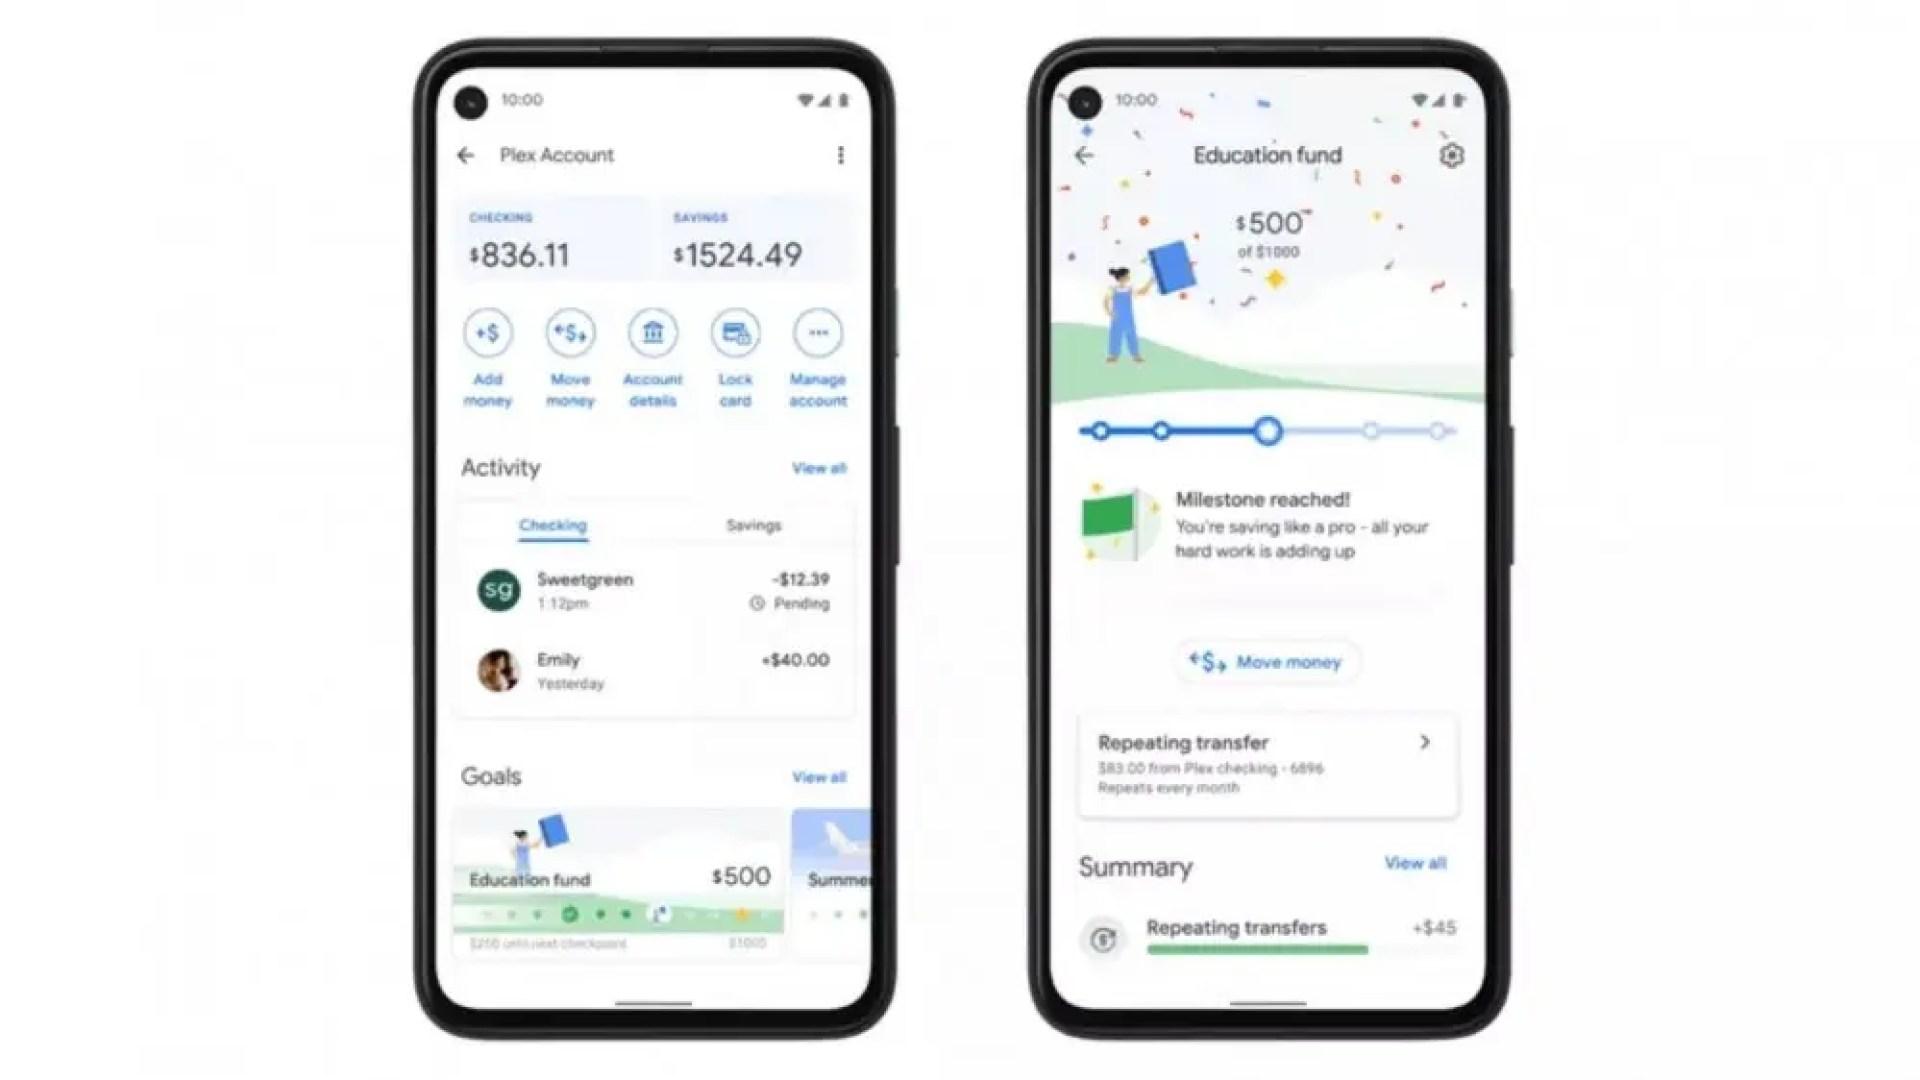 Google Pay Insights tab